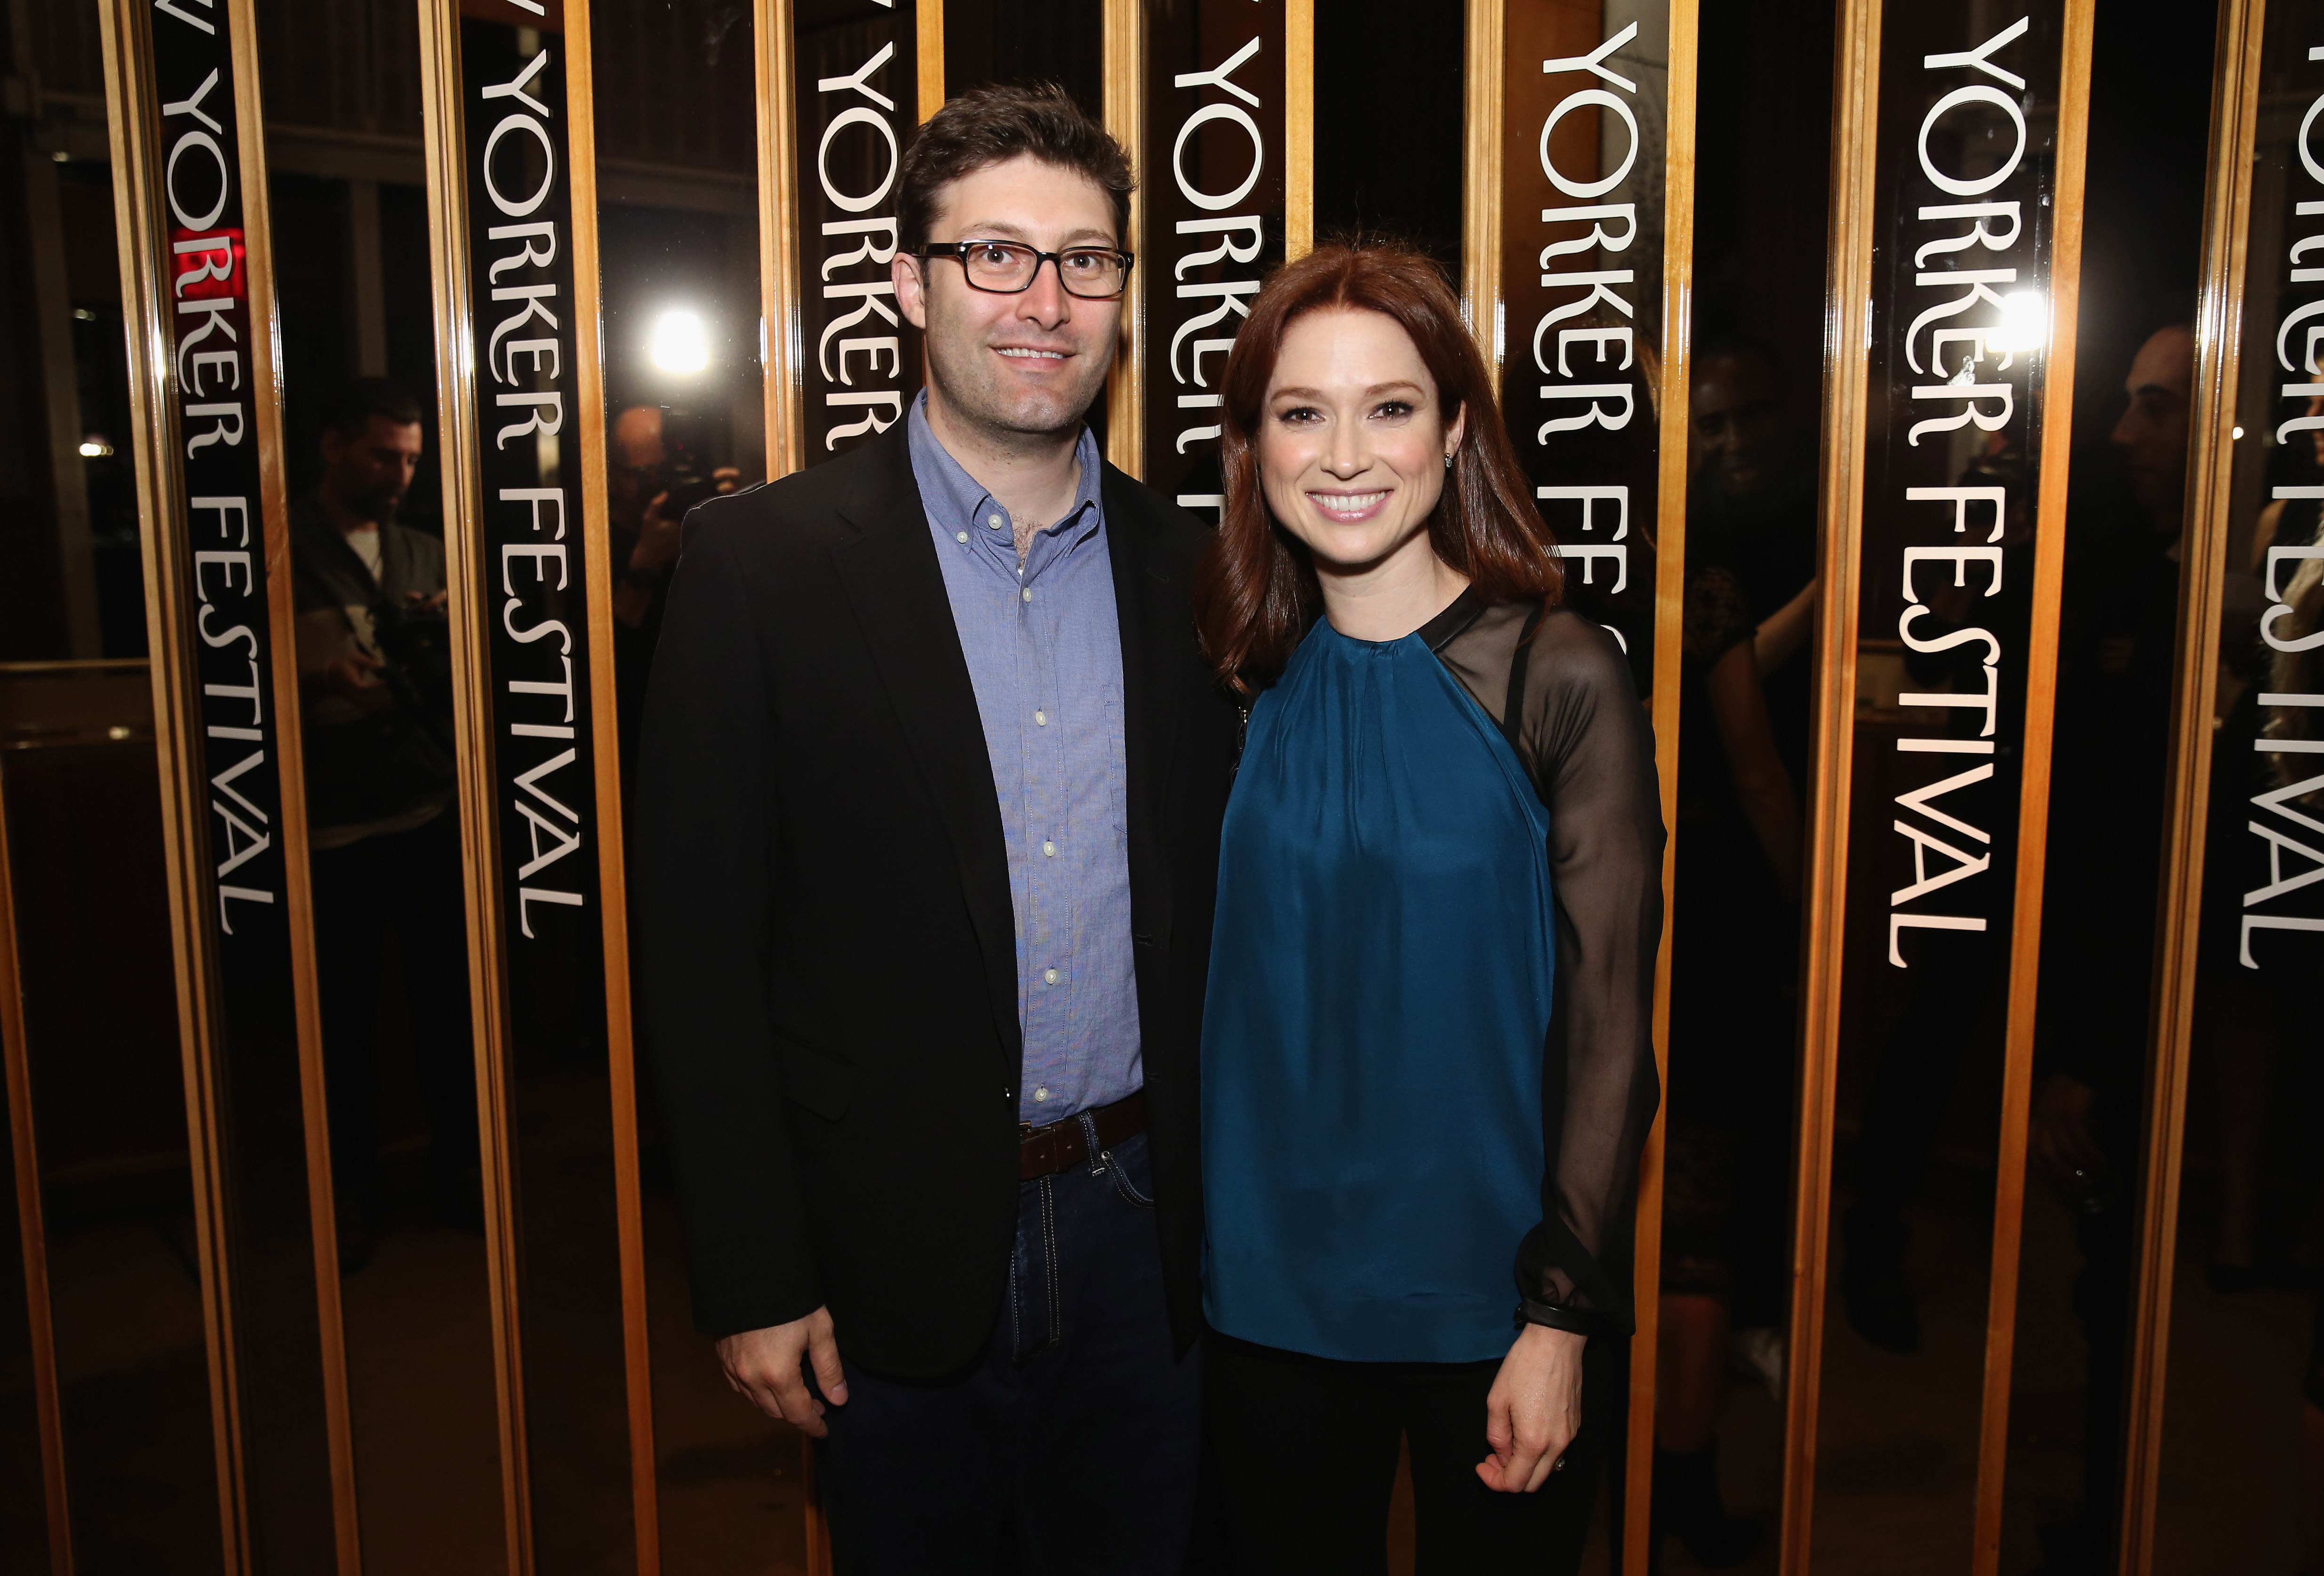 Ellie Kemper and Michael Koman